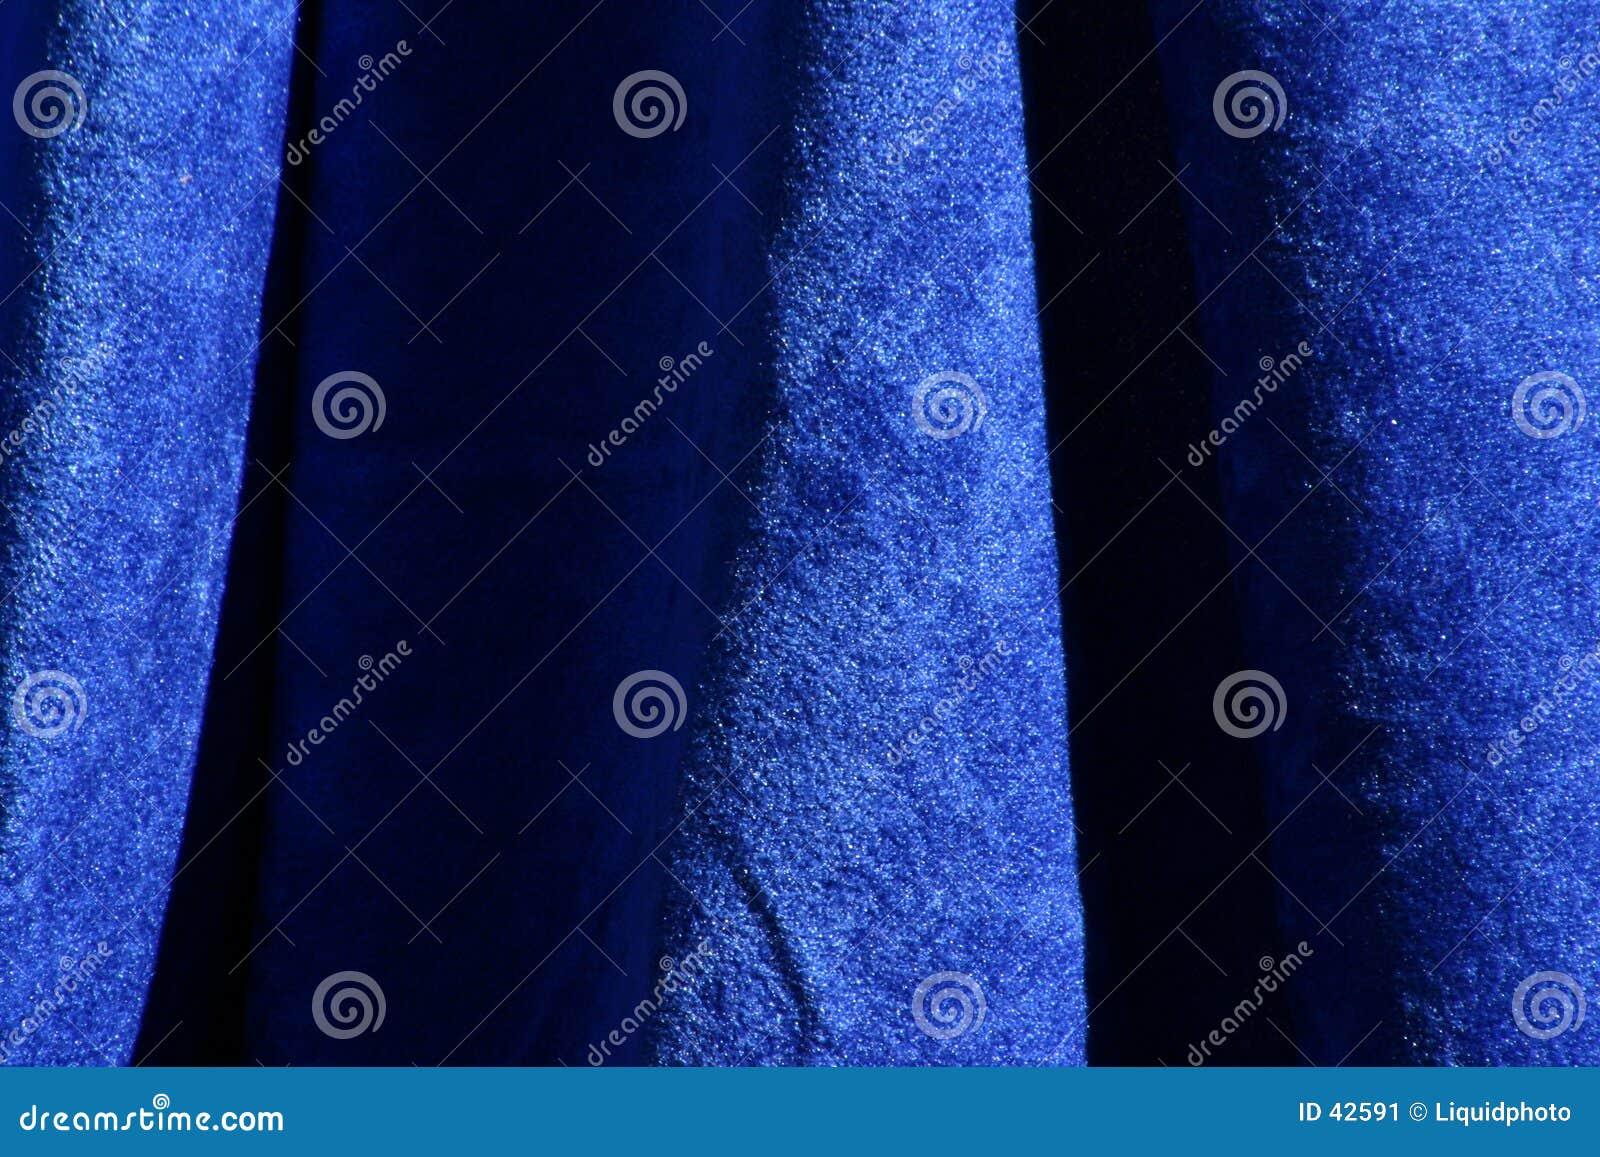 Blue Velvet Fabric Texture